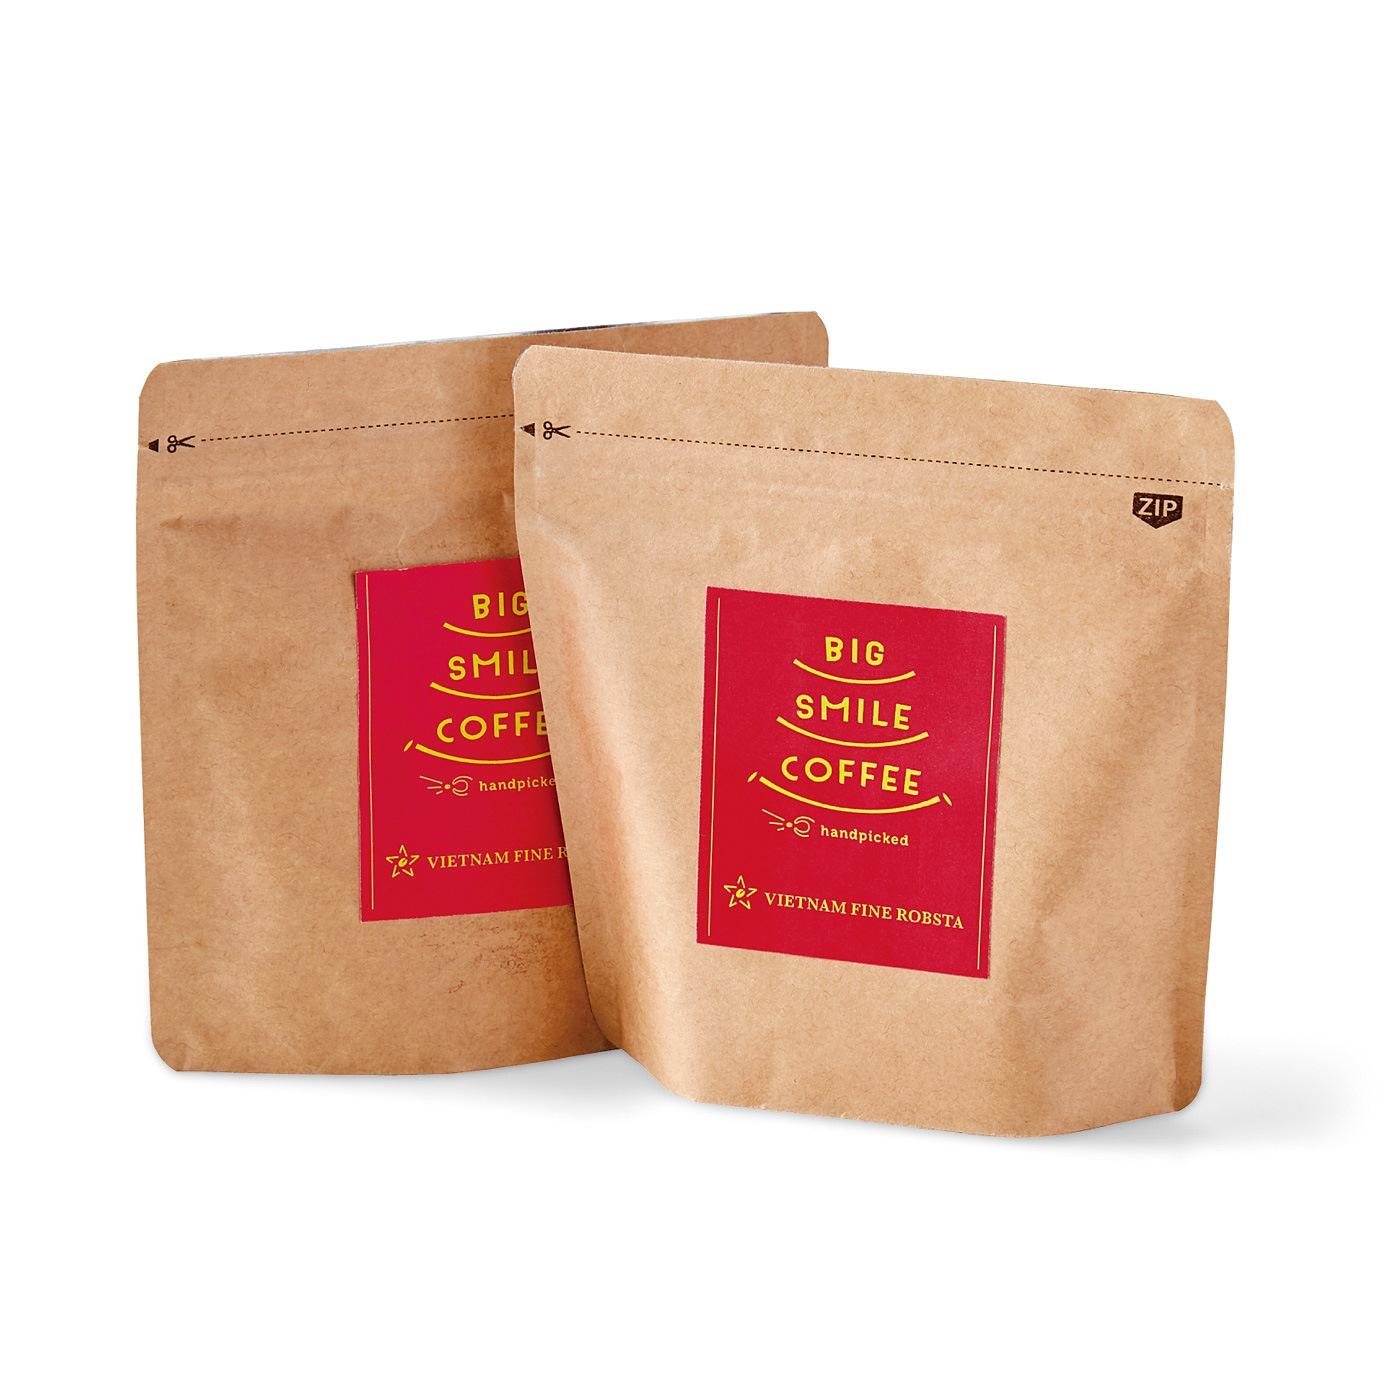 BIG SMILE COFFEE ベトナムからのスペシャルな豆で楽しむコーヒー味比べ2種セット アレンジレシピ付きの会